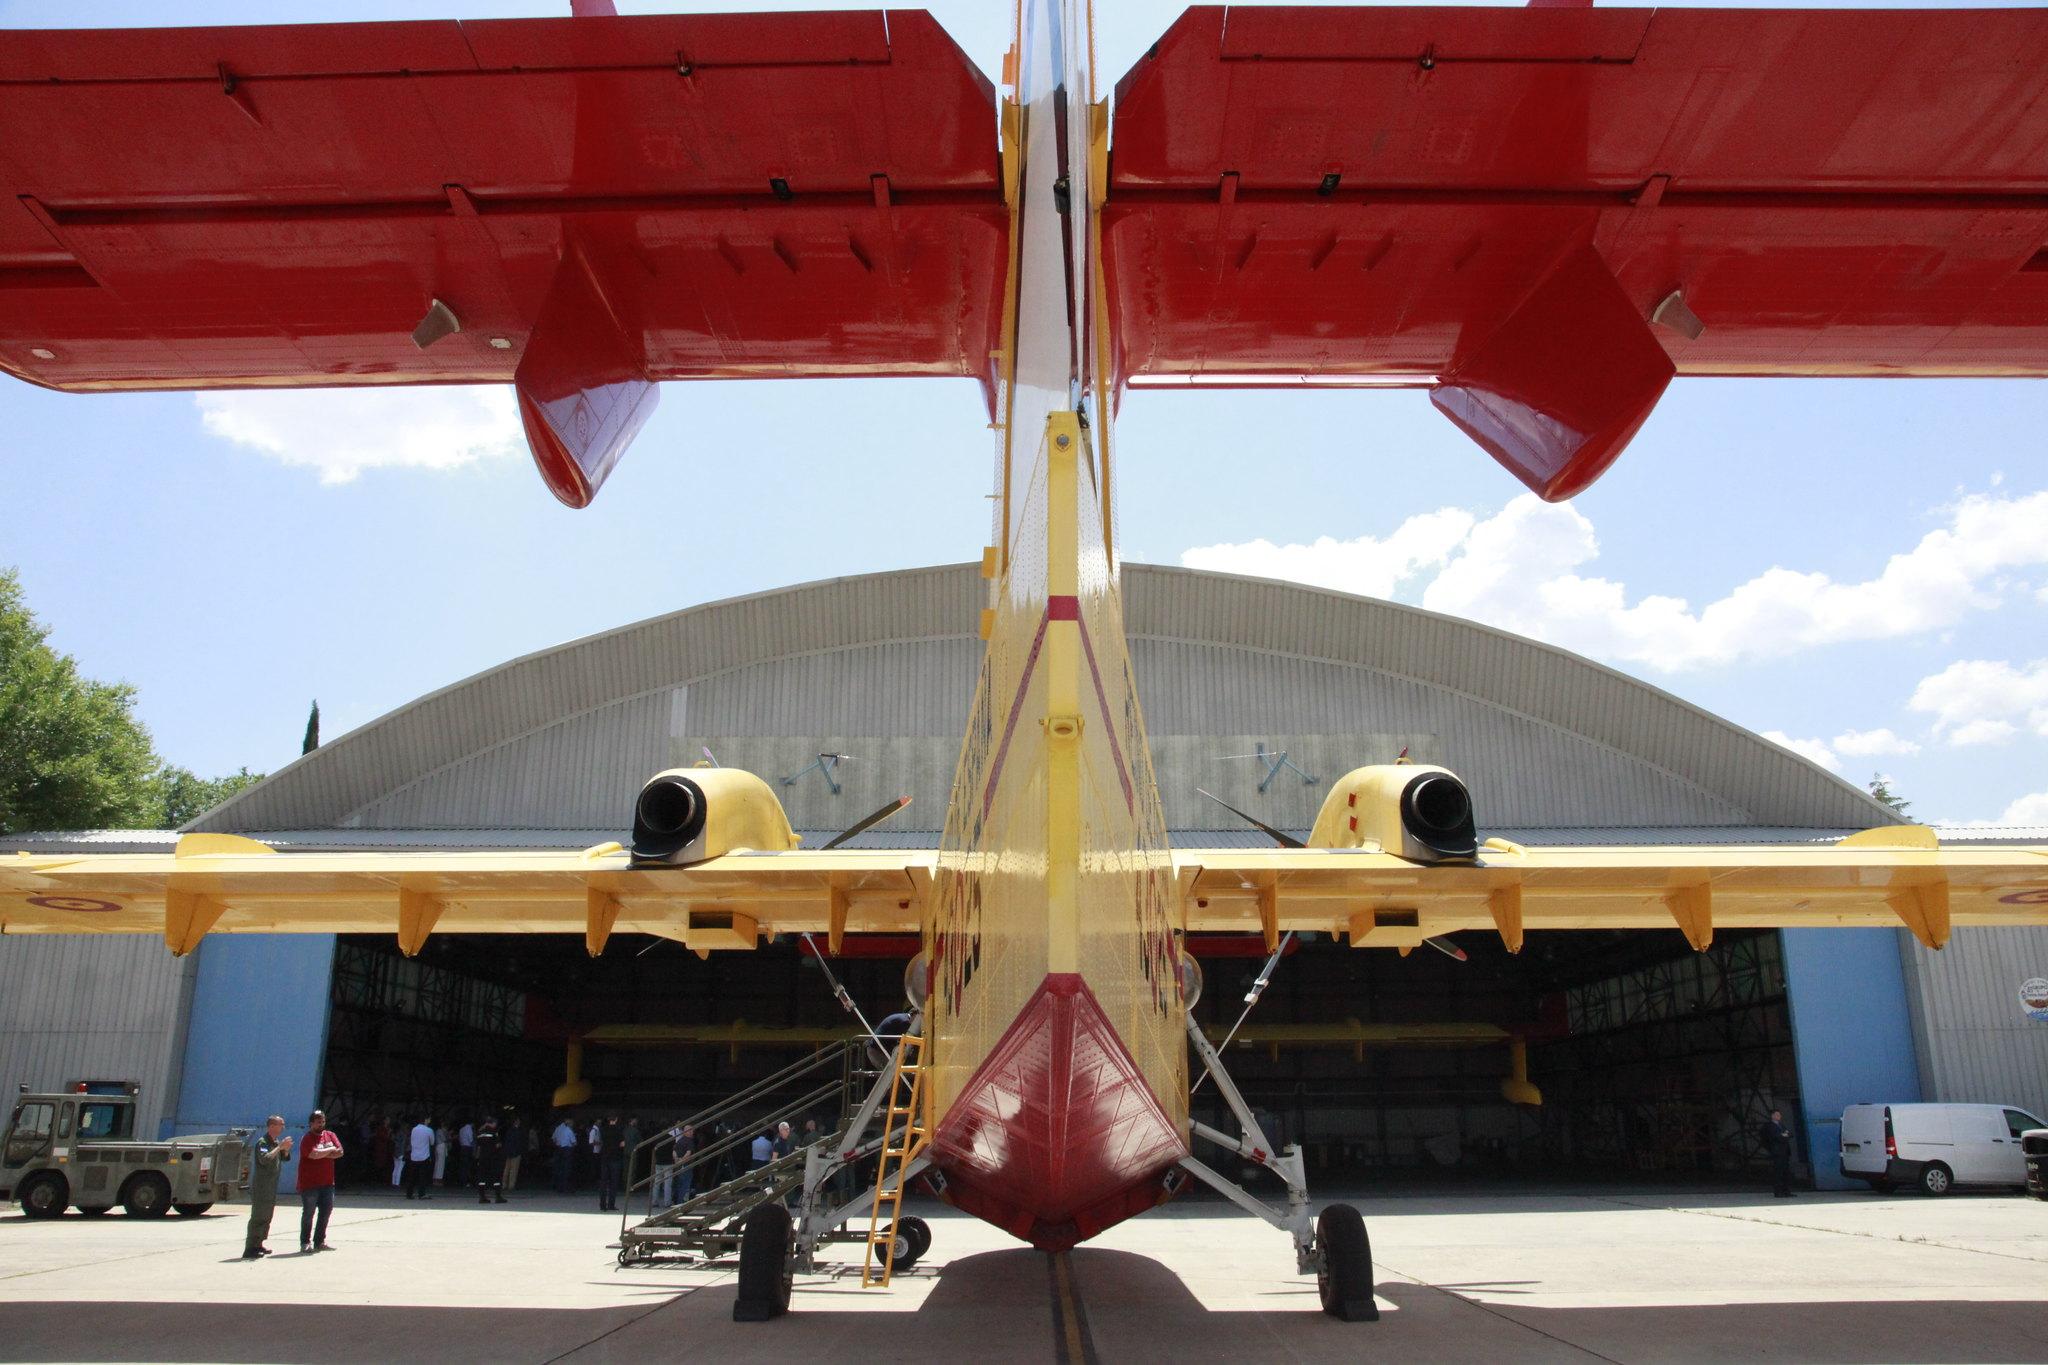 Canadair del 43 Grupo del Ejército del Aire